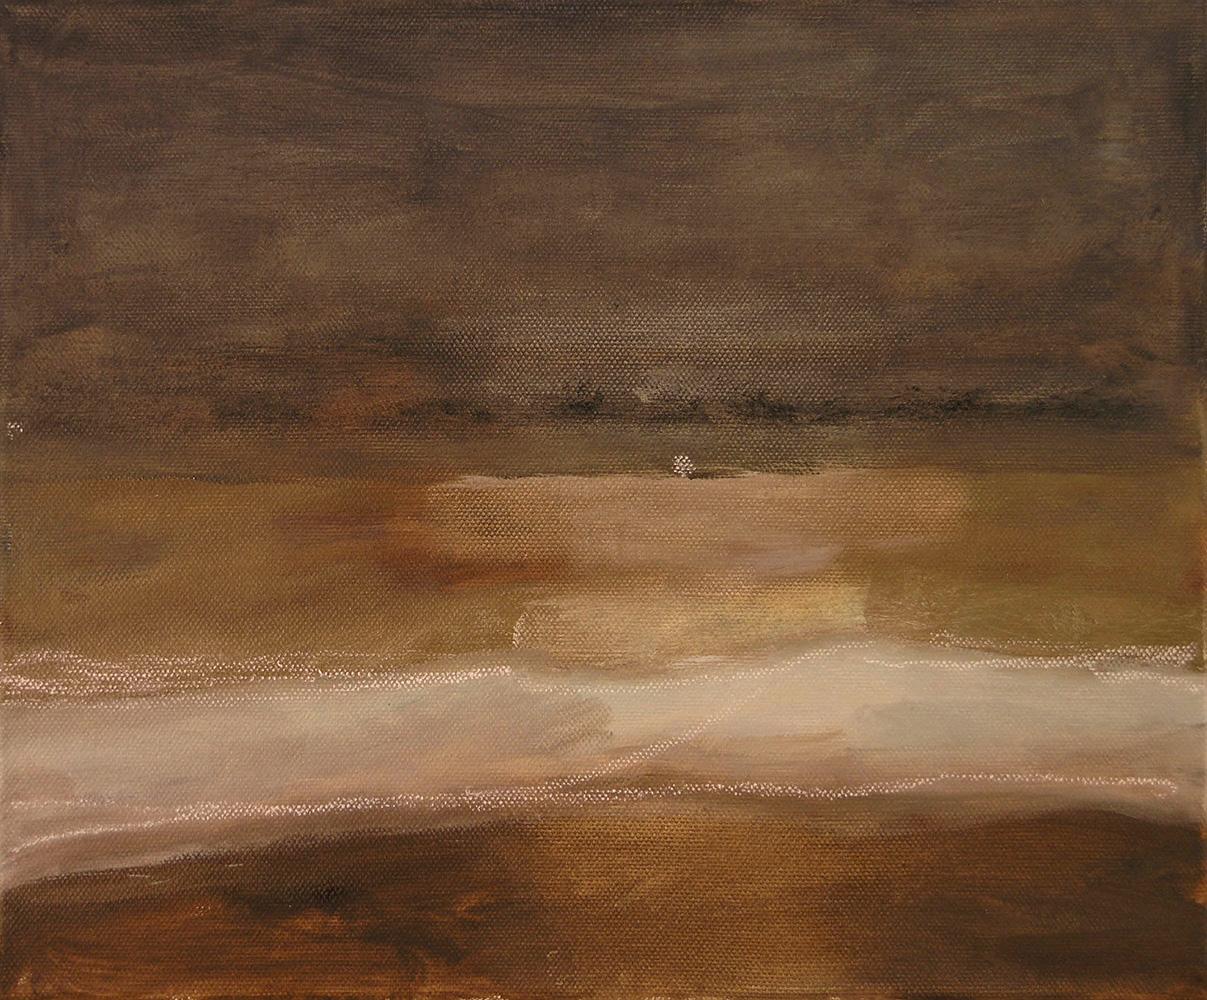 untitled. Oil on Linen